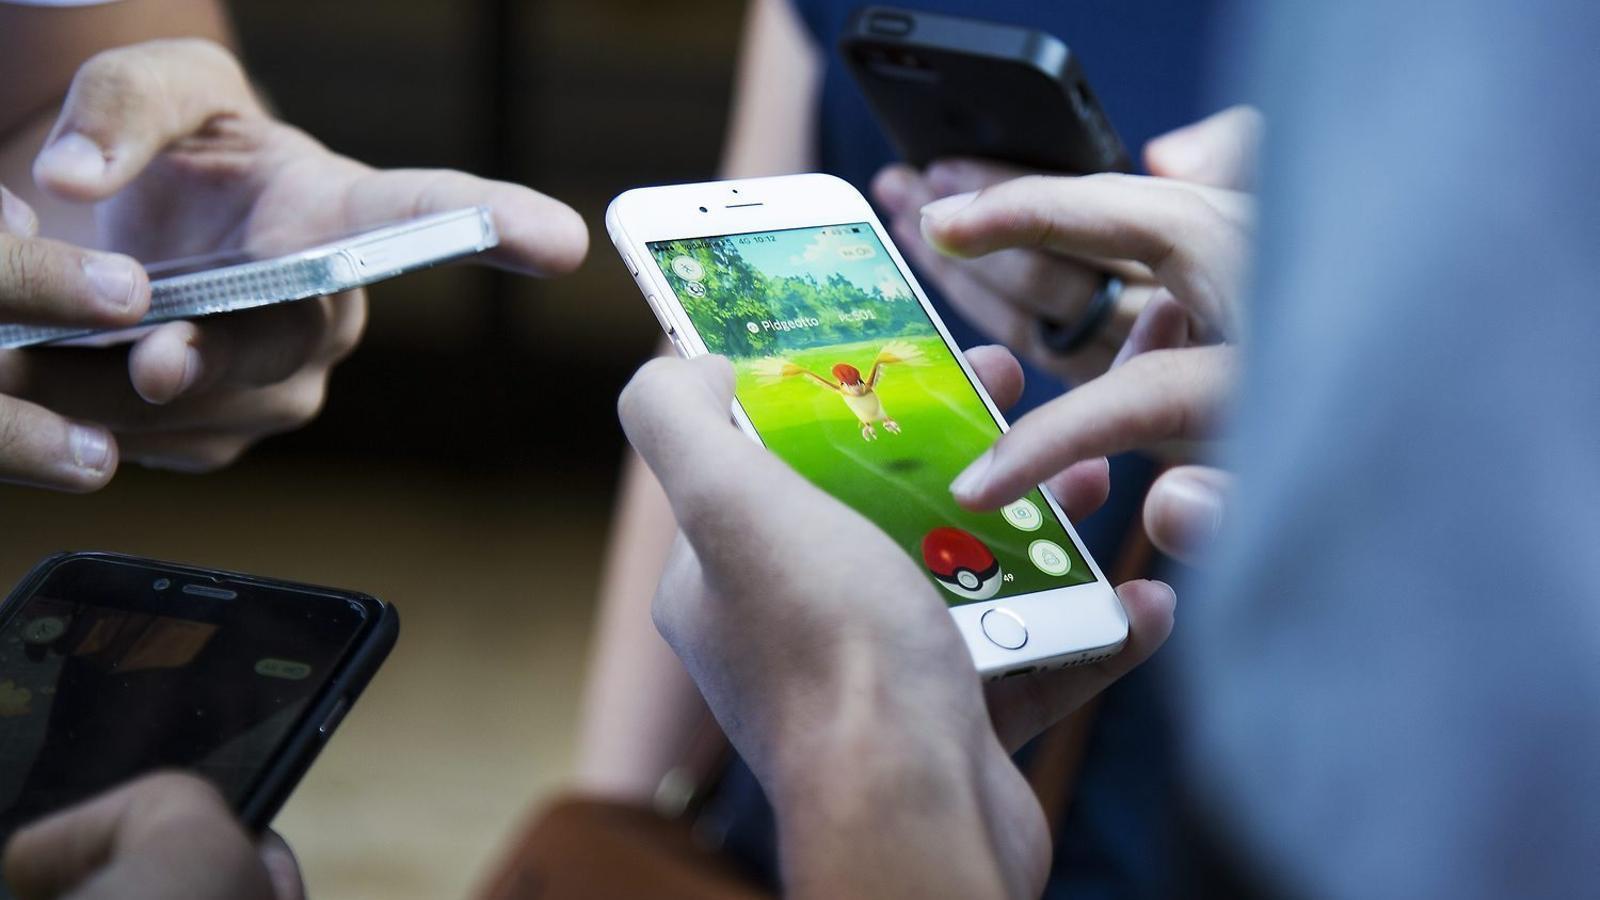 Pokémon Go, per jugar en família / FRANCESC MELCION